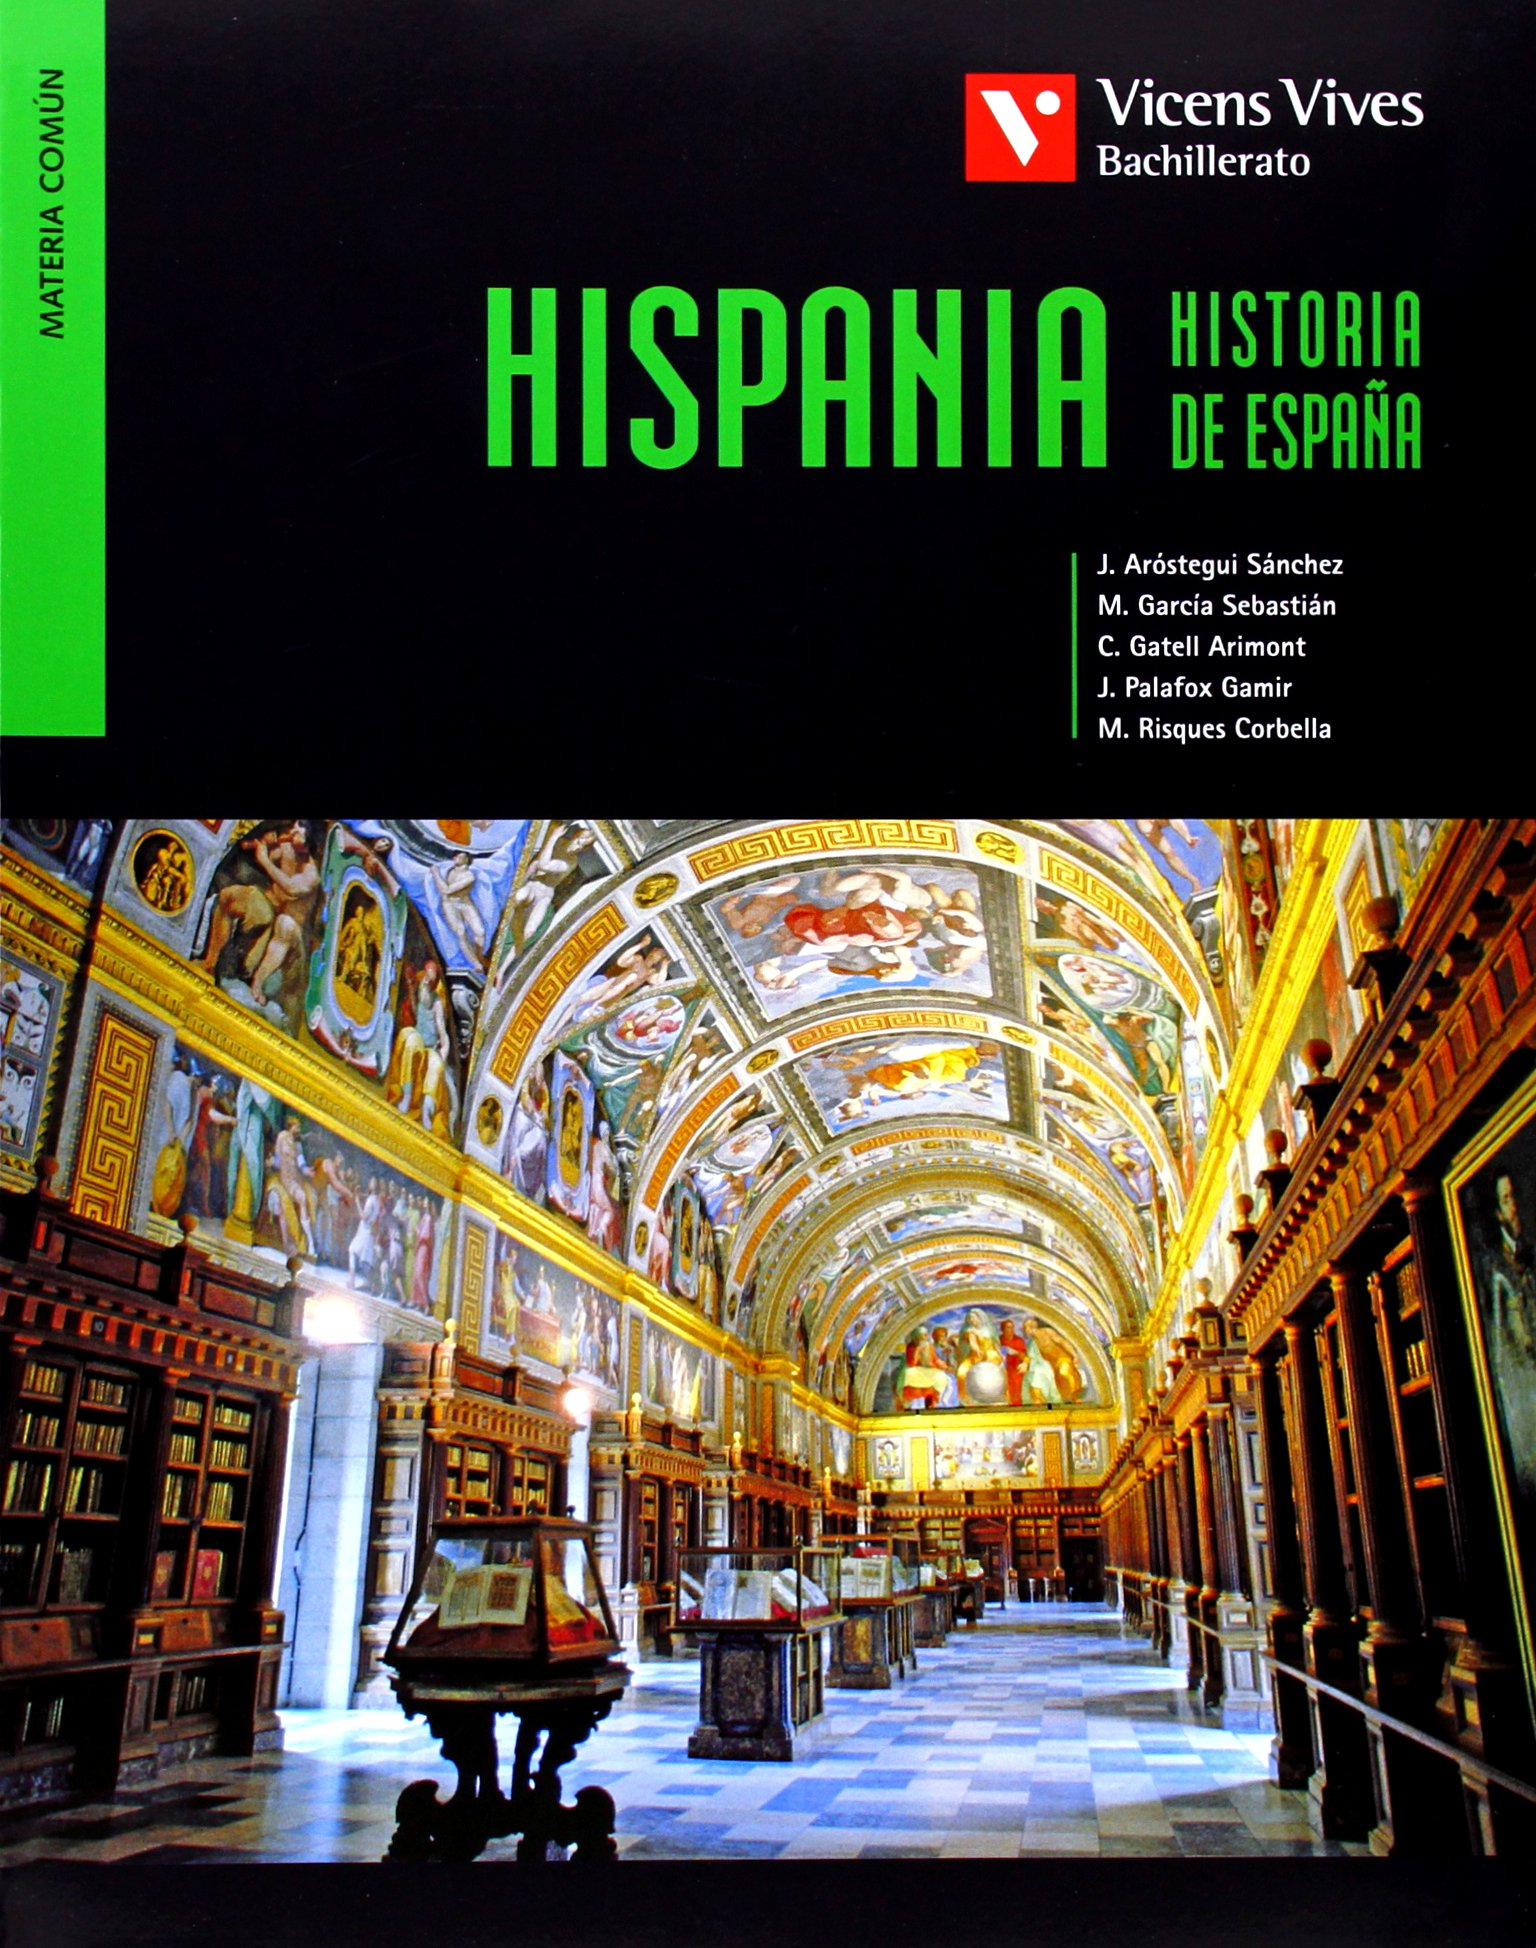 Historia De España Murcia Separata - 9788431614263: Amazon.es: Nicolas Marin, Maria Encarna, Sanchez Pravia, Maria Jose: Libros